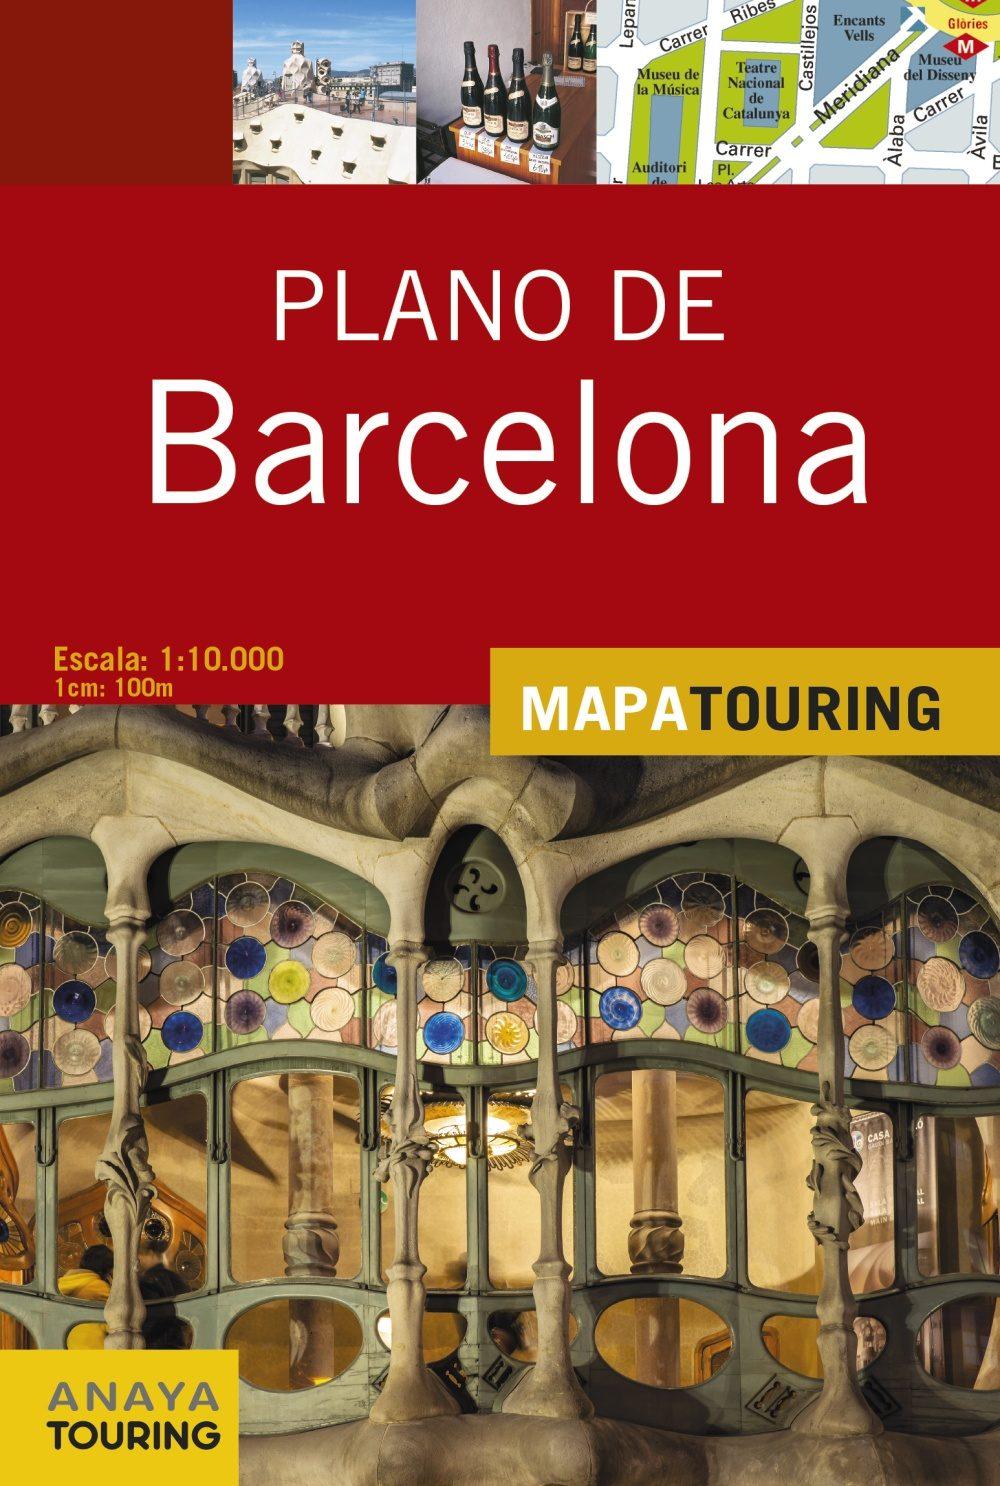 Plano De Barcelona 2015 (mapa Touring) (6ª Ed.) por Vv.aa. epub